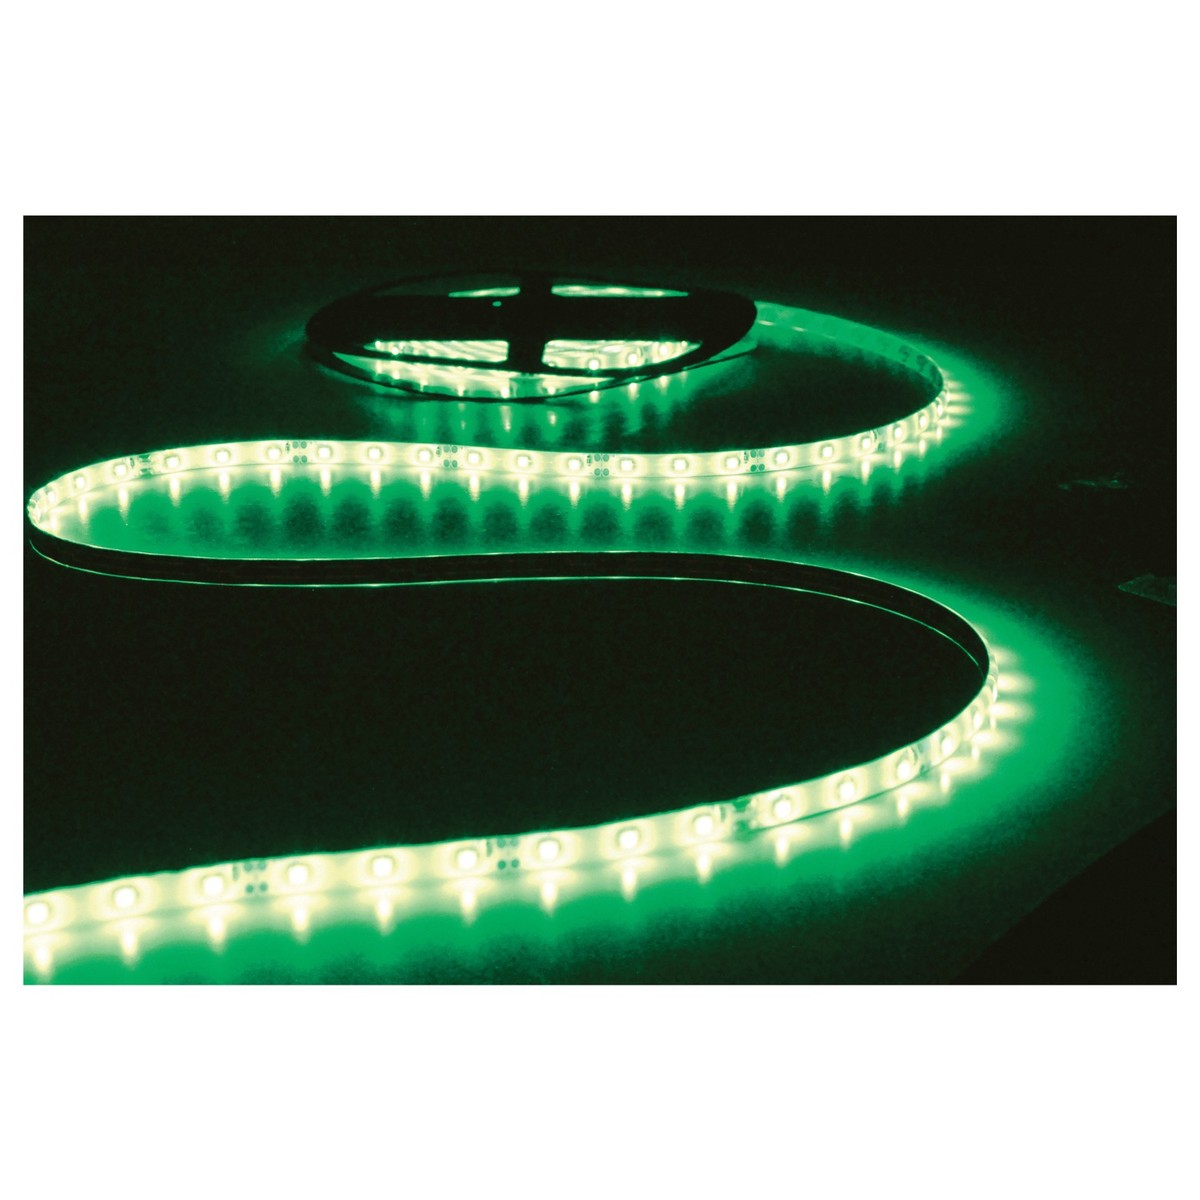 eagle flexible led tape light kit 5m with psu green at. Black Bedroom Furniture Sets. Home Design Ideas